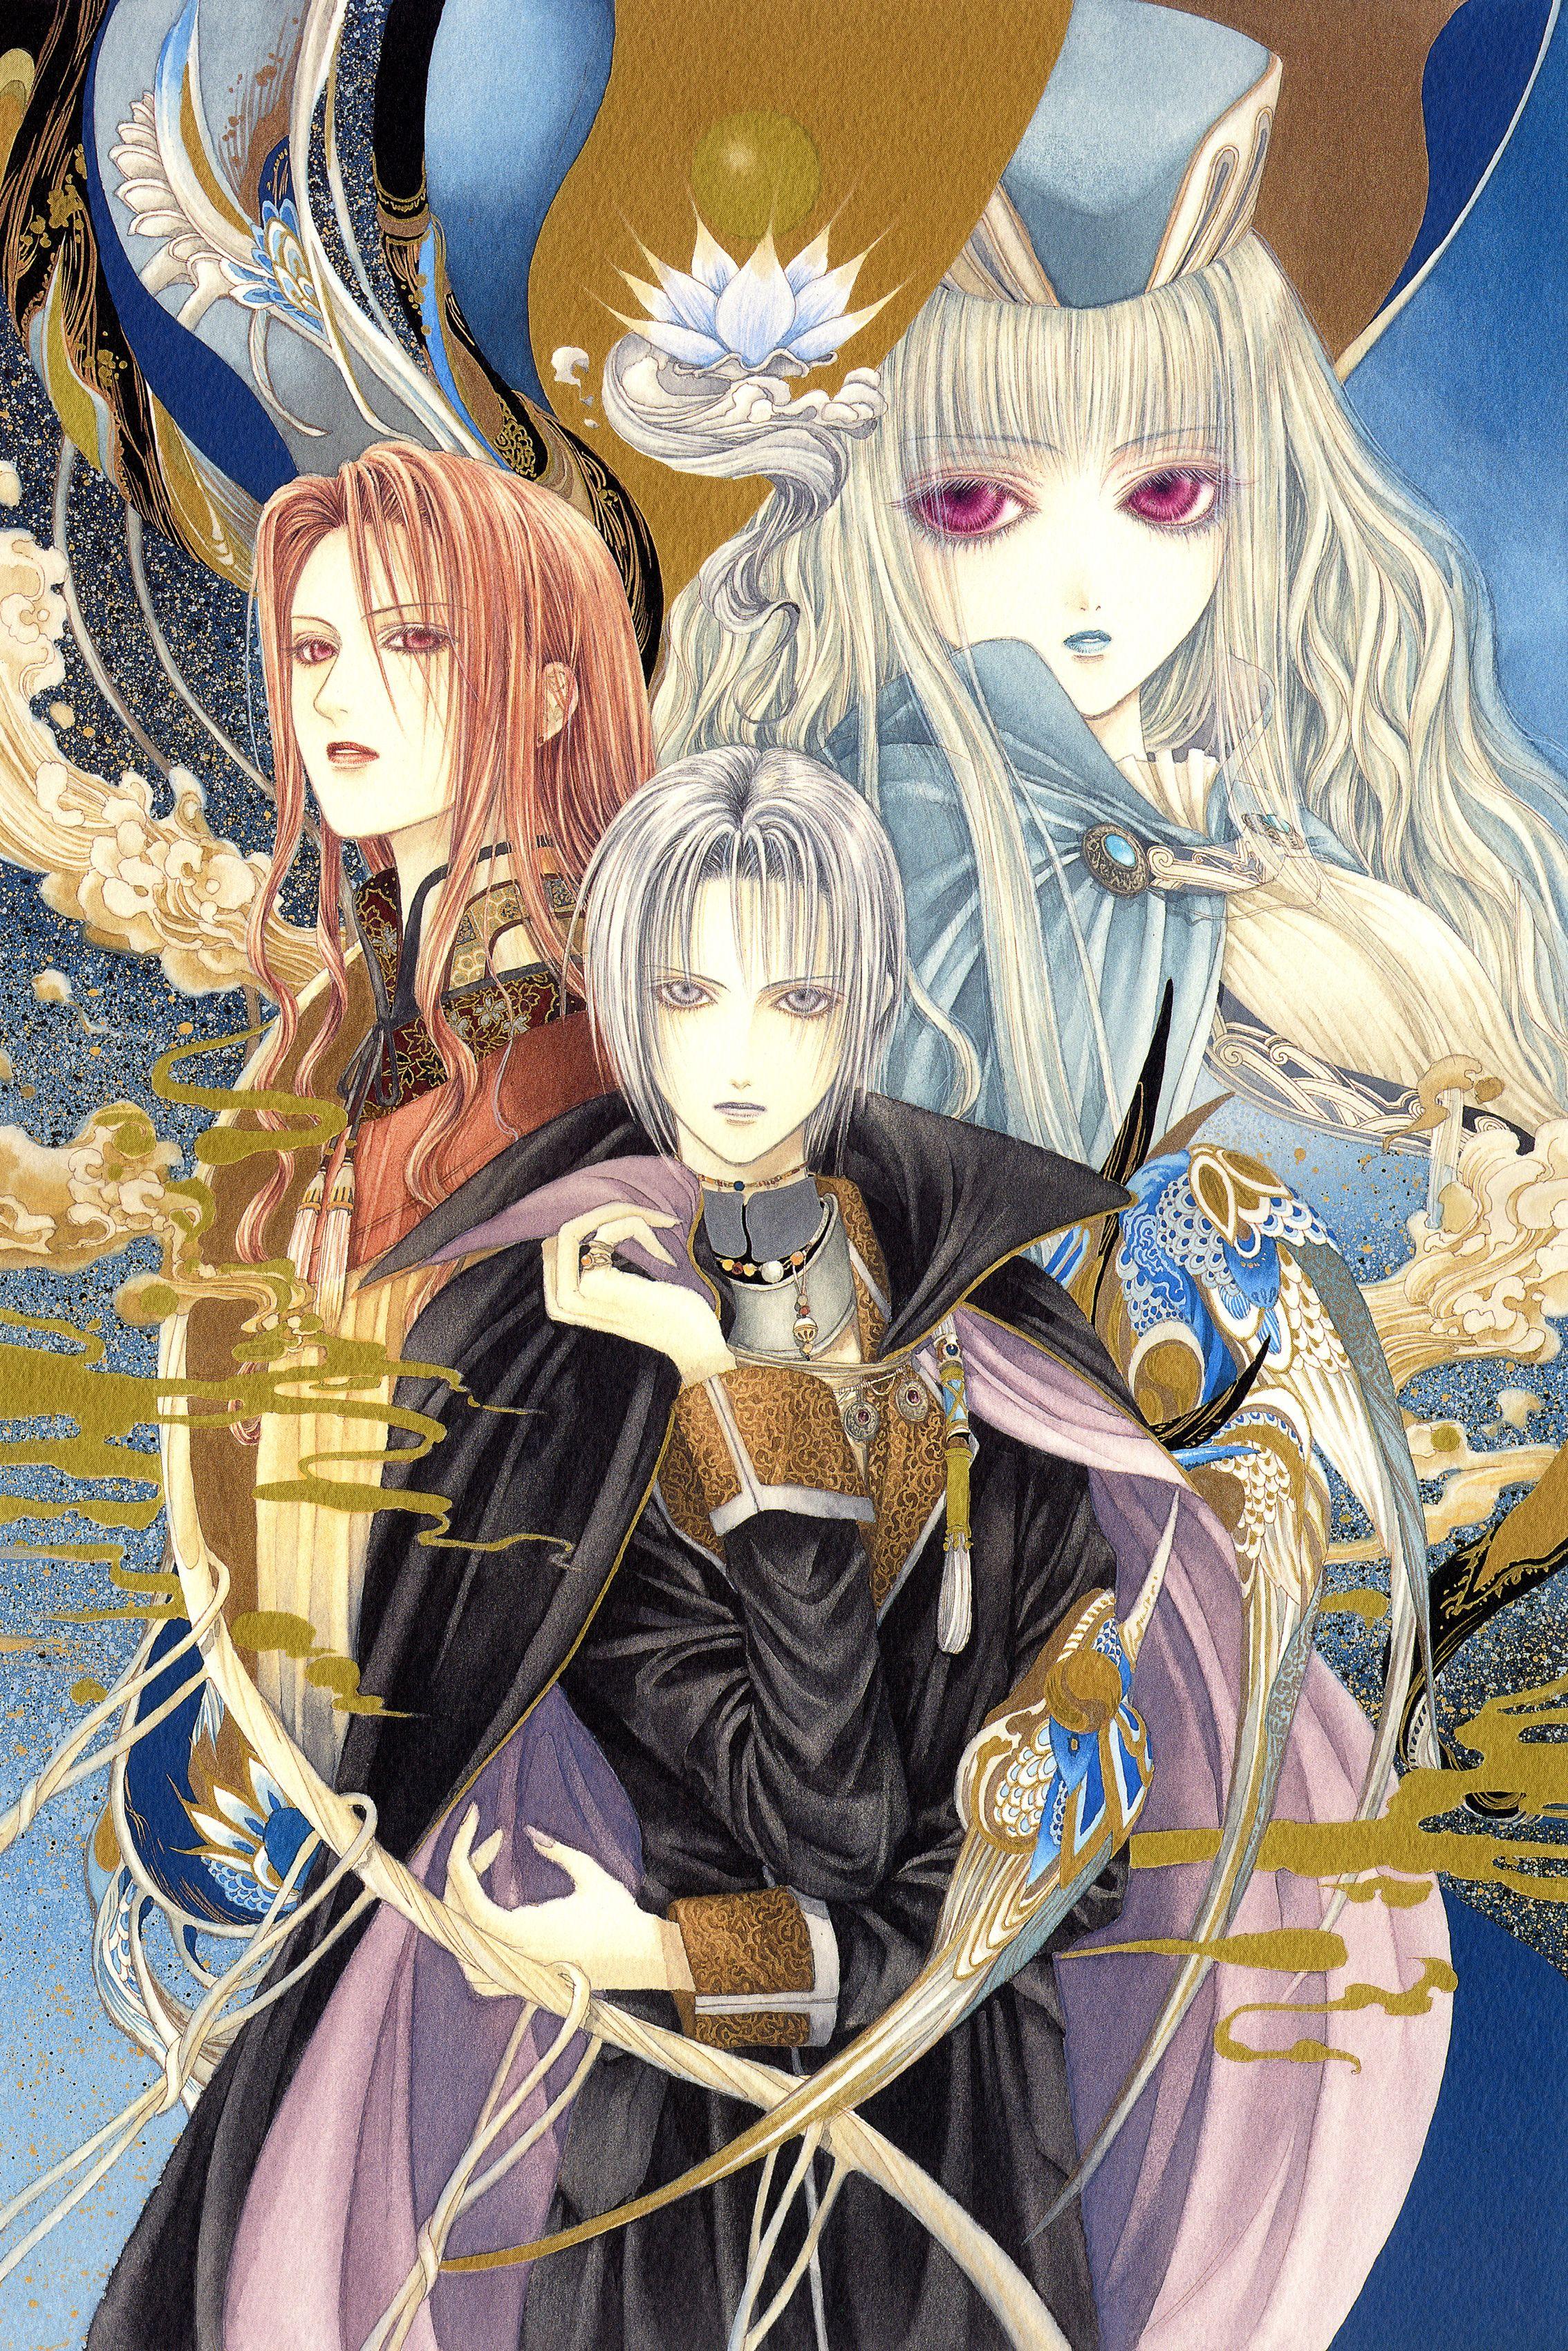 Épinglé par Artistes sur Kouyu SHUREI Dessin manga